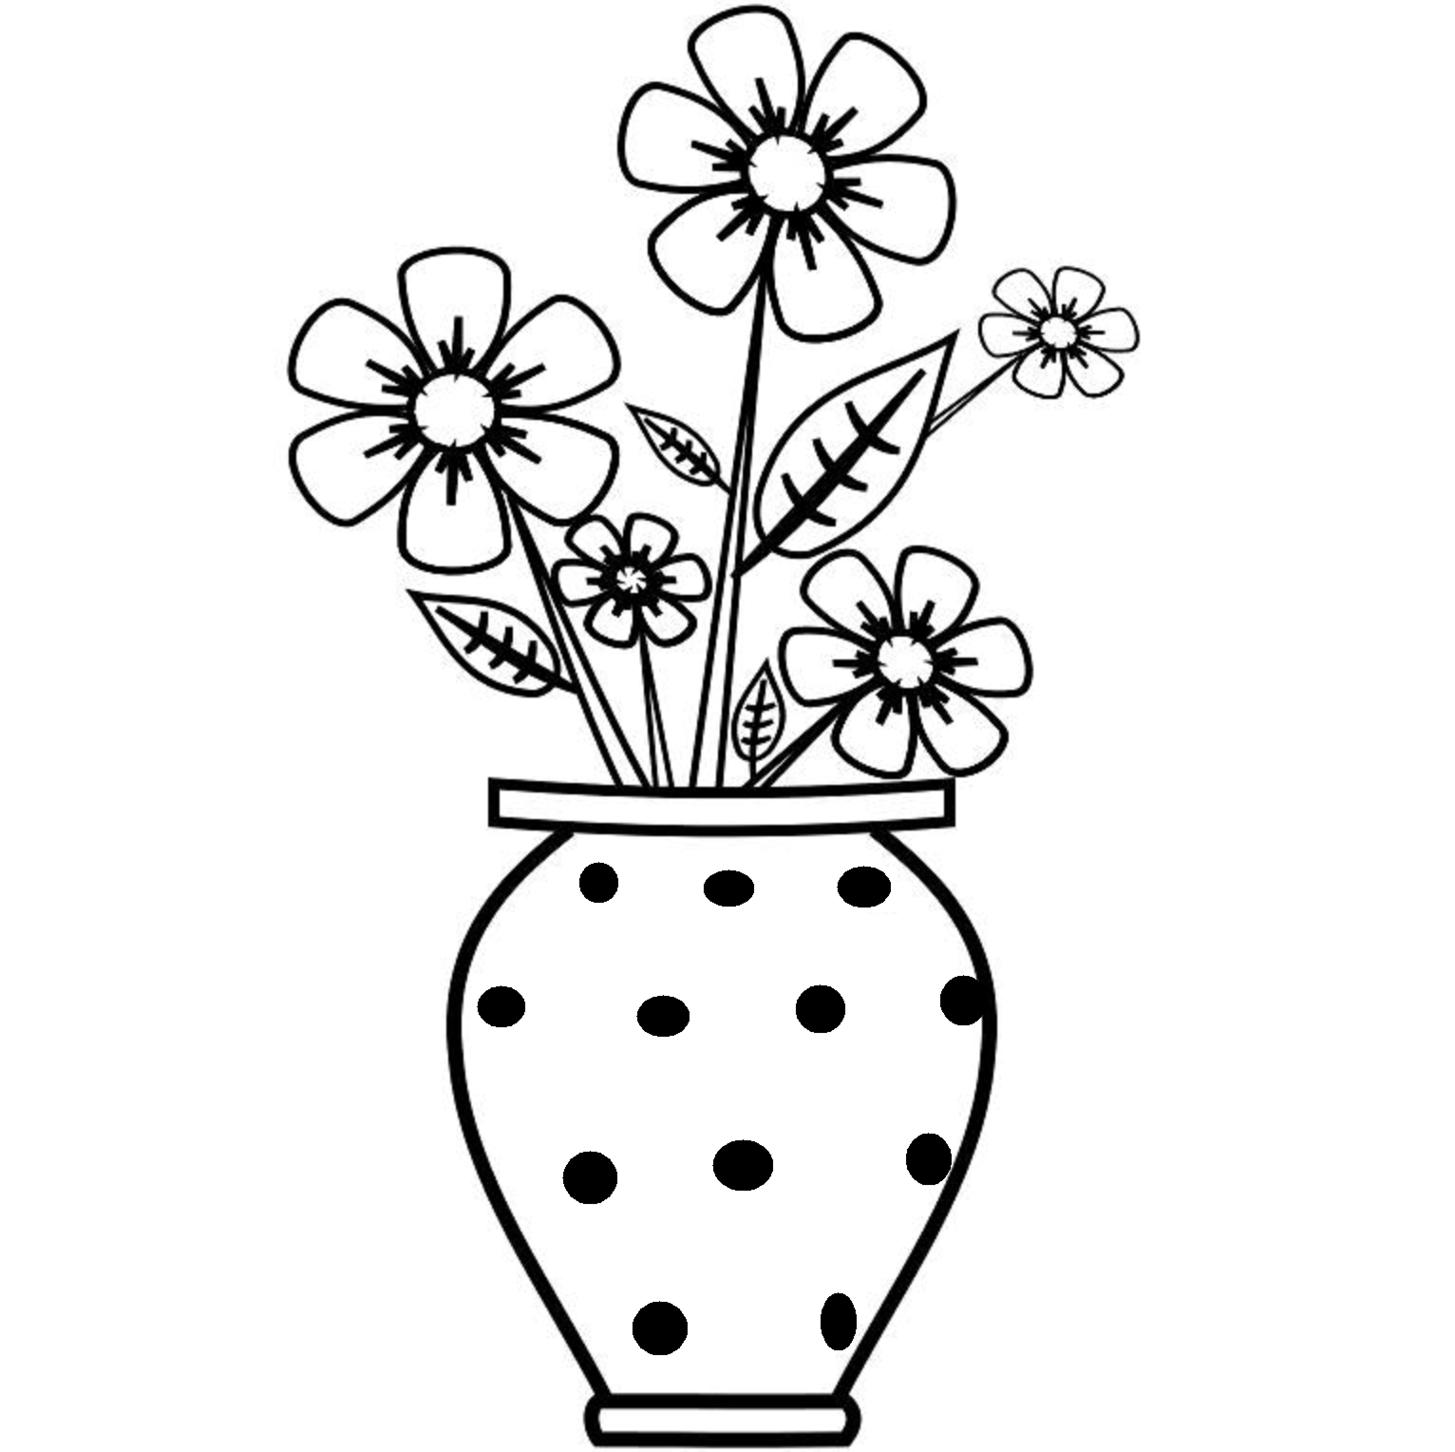 Image Result For Clipart Vase Flower Drawing For Kids Flower Vase Drawing Easy Flower Drawings